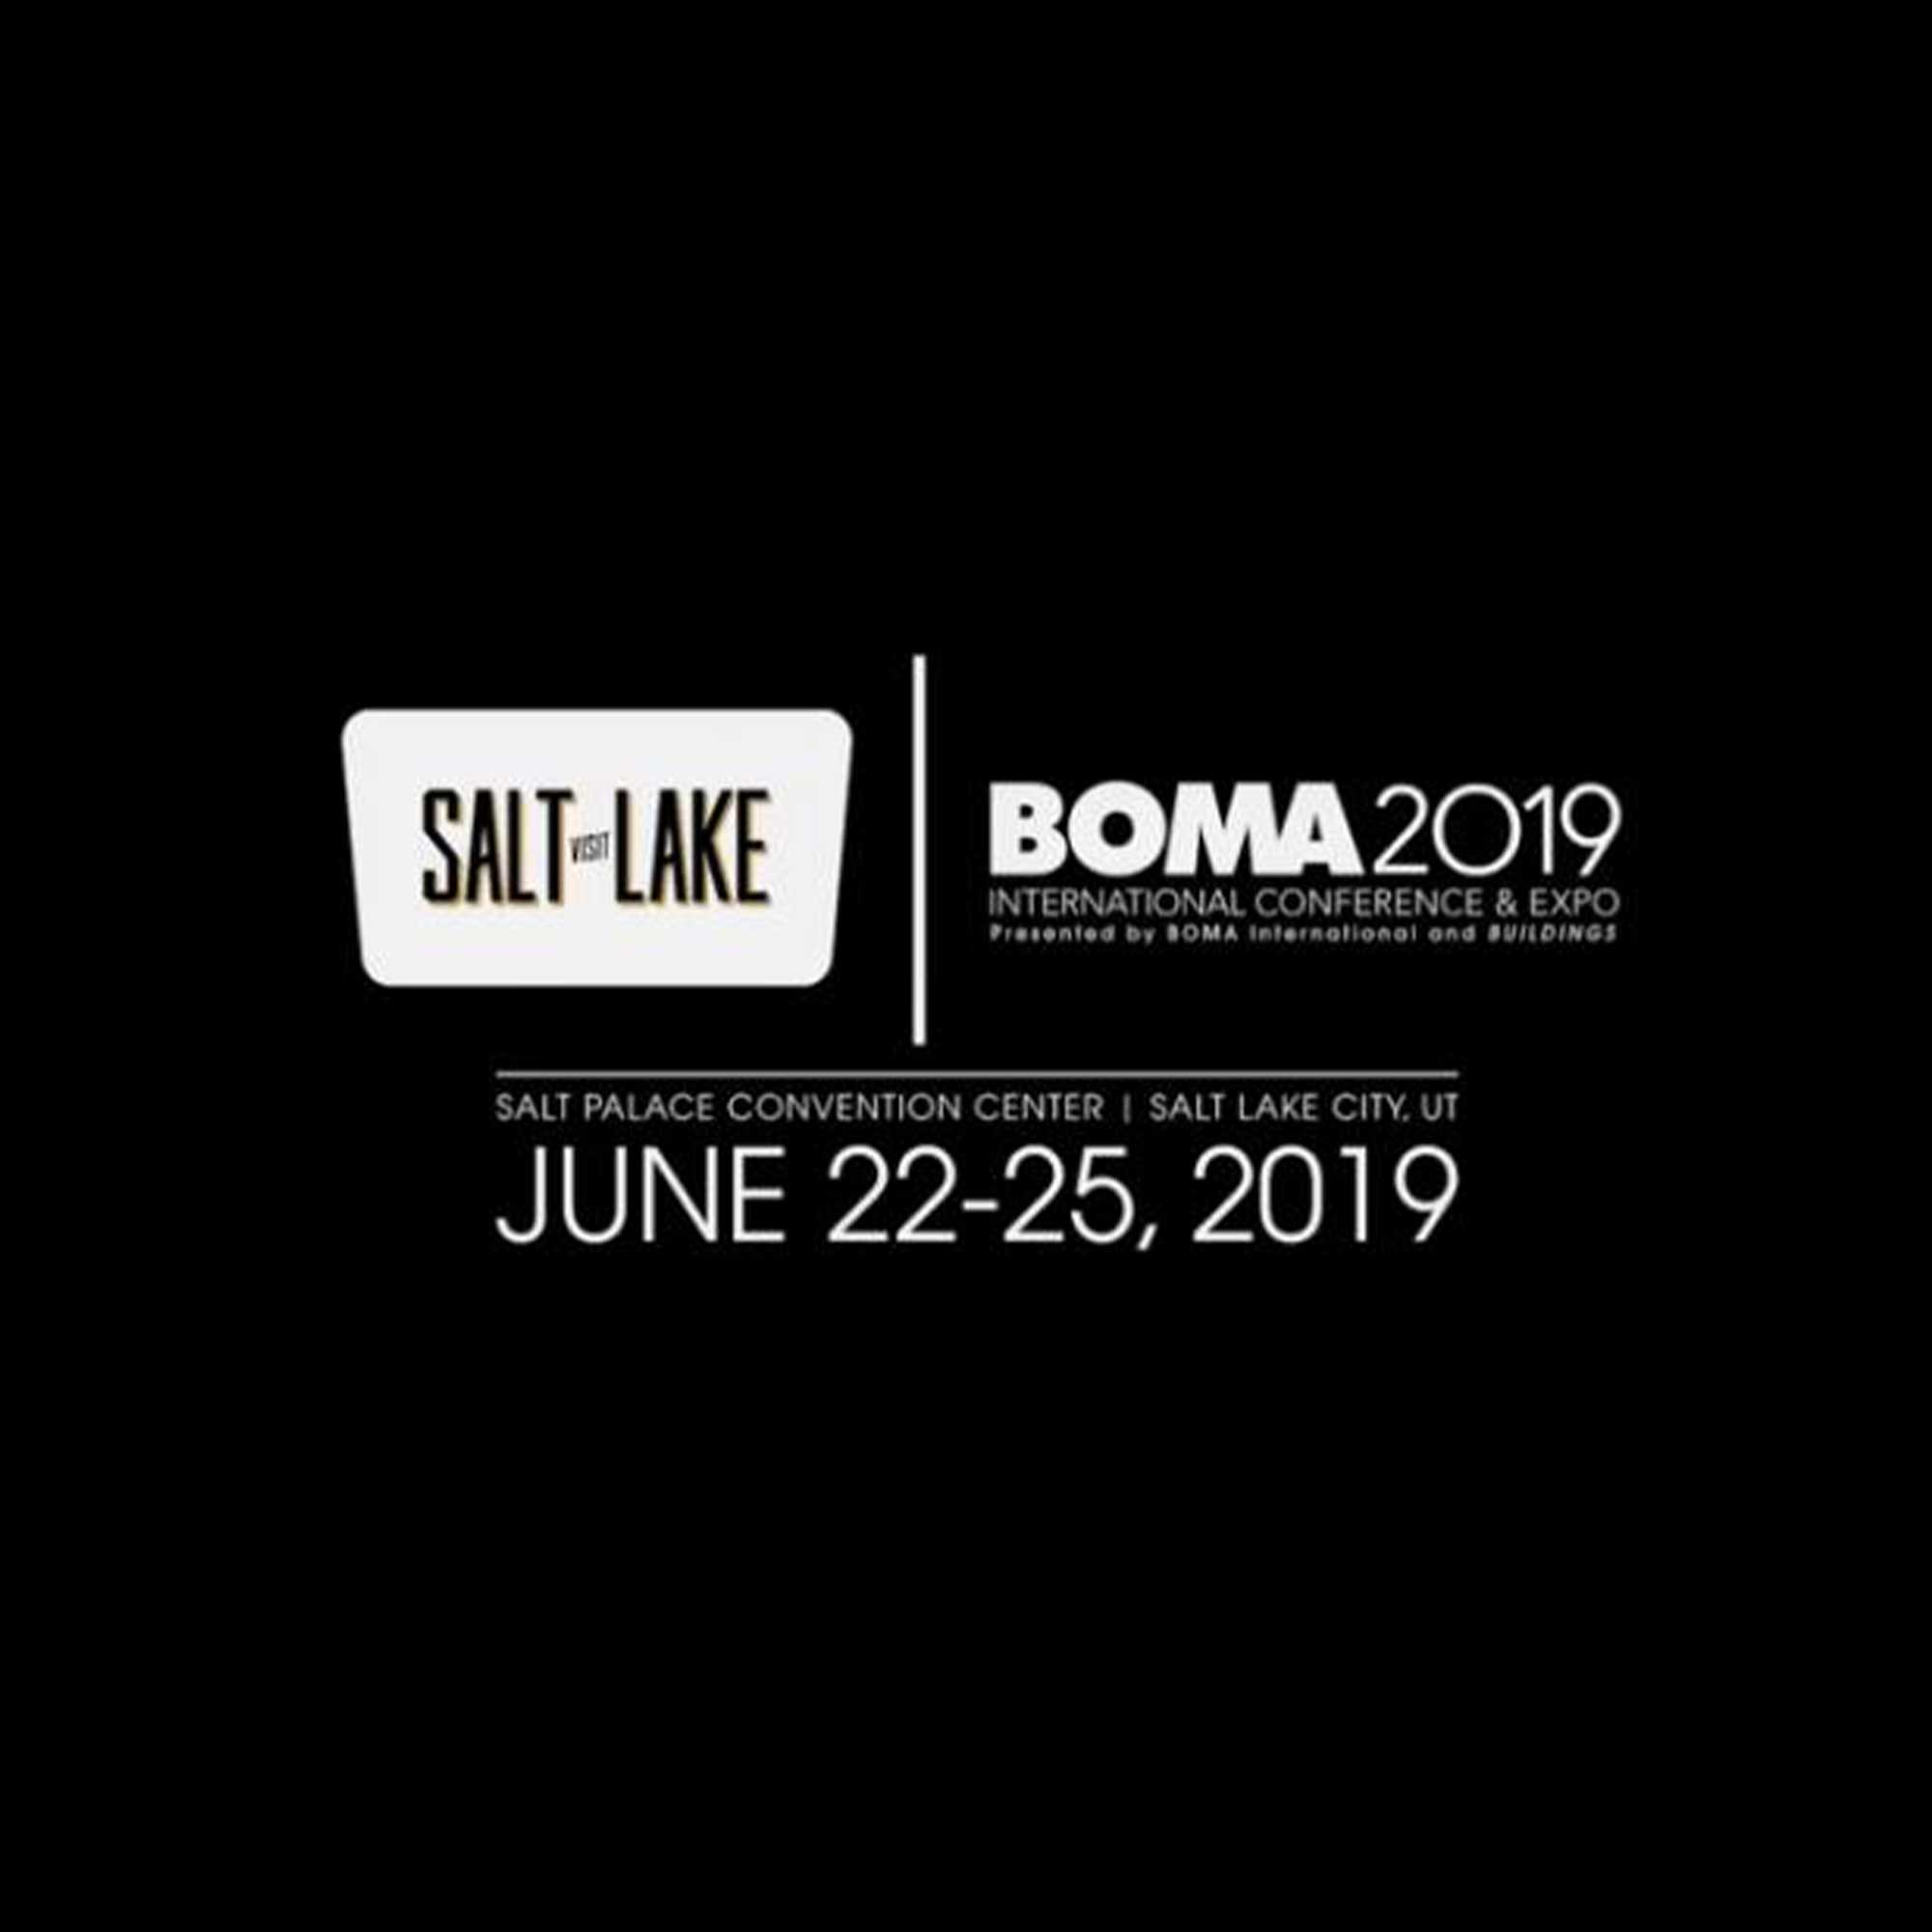 BOMA 2019